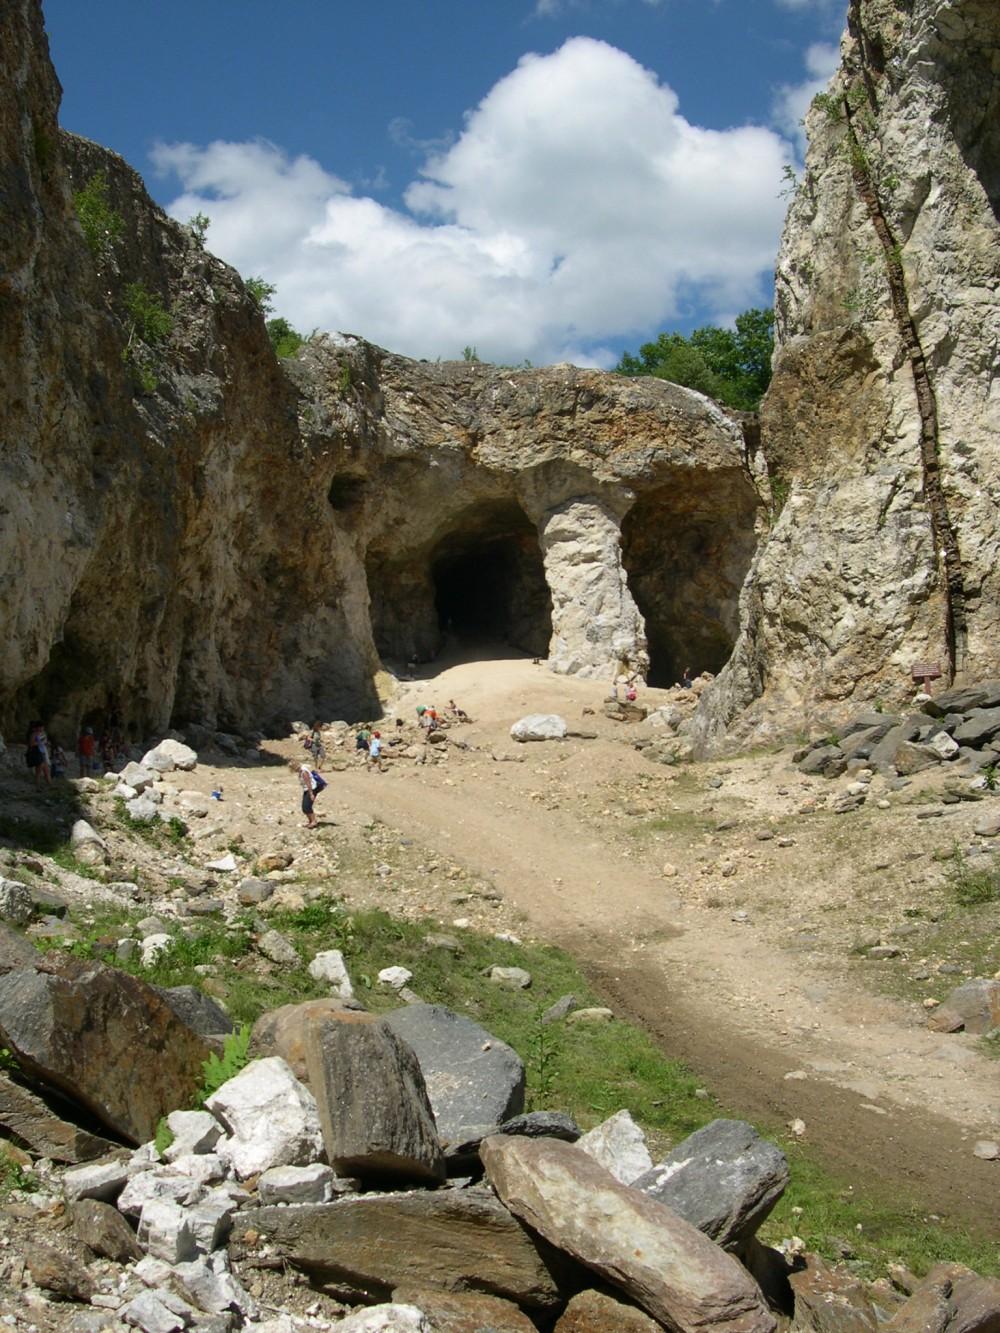 Ruggles Mine tourist attraction